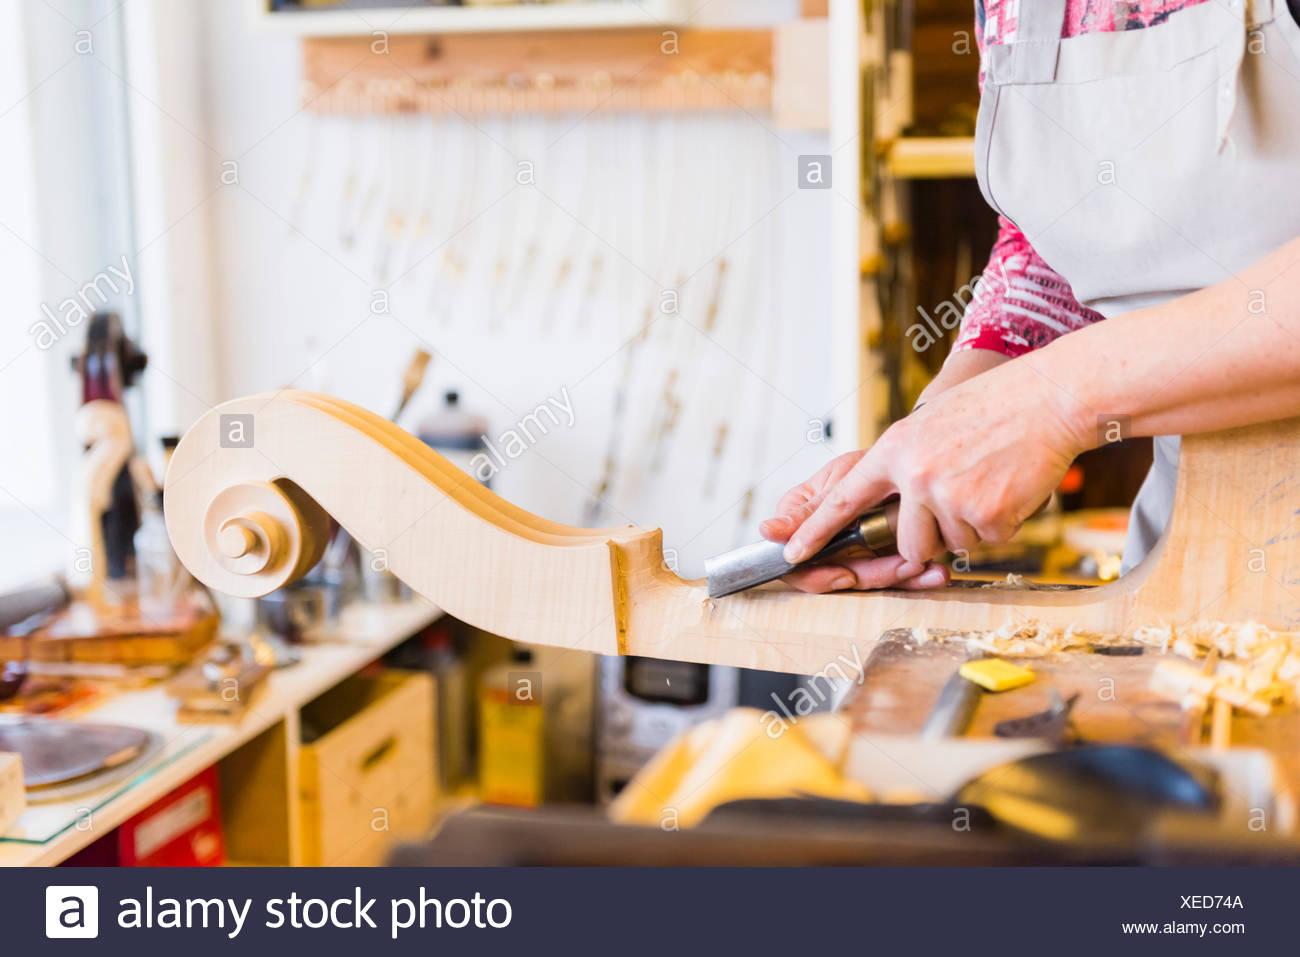 Violin maker making violins in production studio - Stock Image